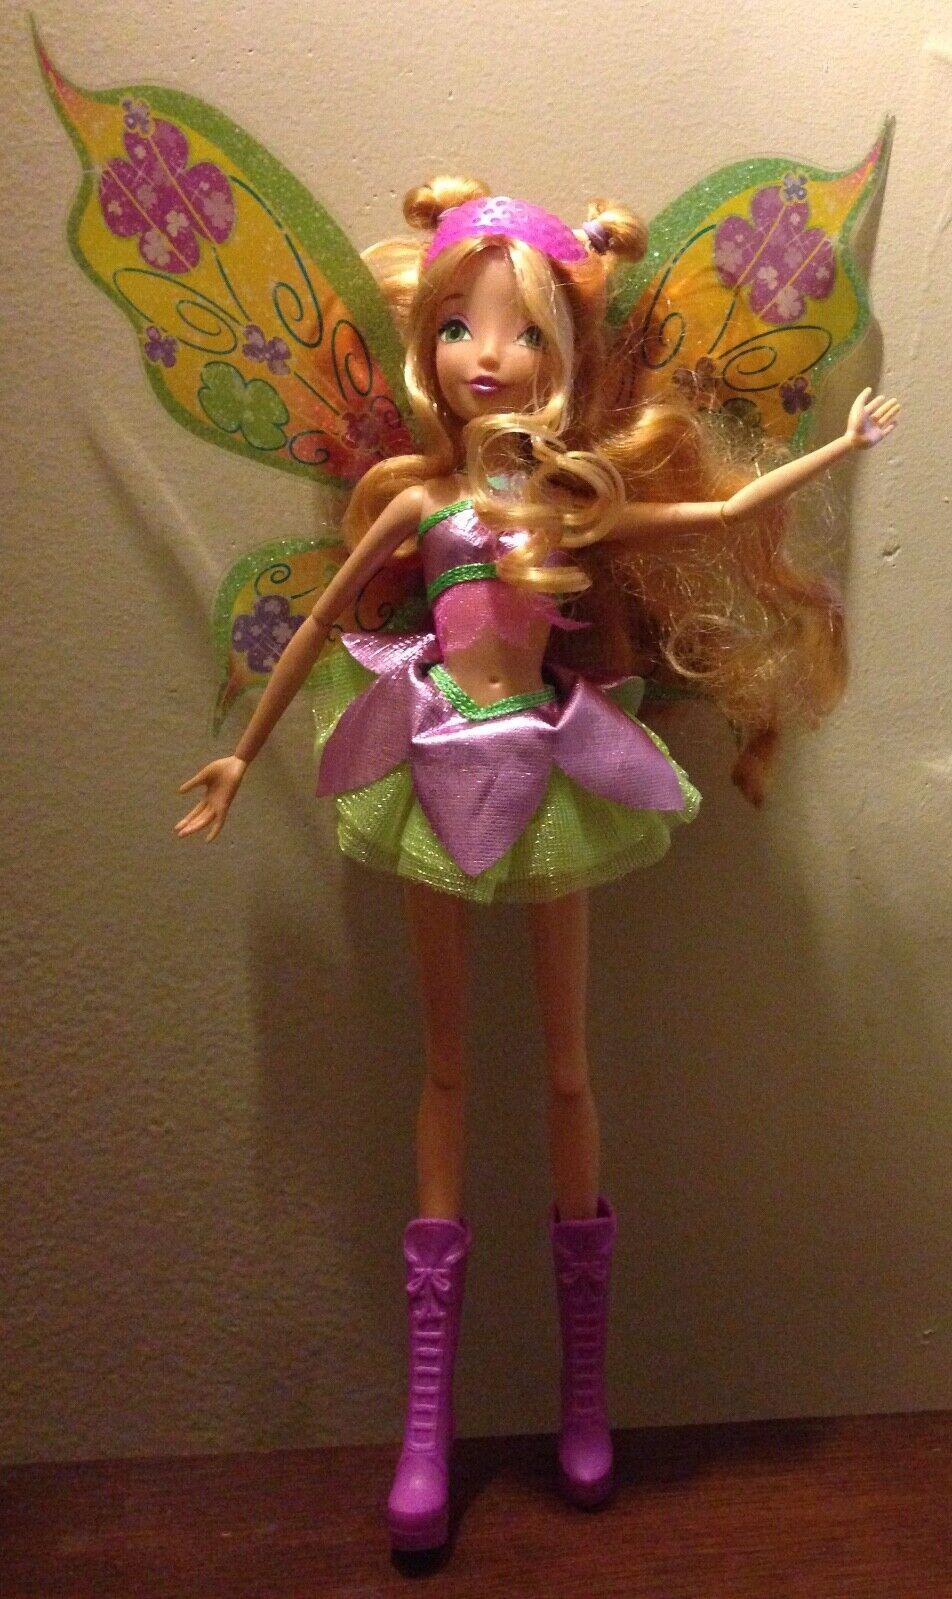 Winx club flora believix, marioneta Nickelodeon.